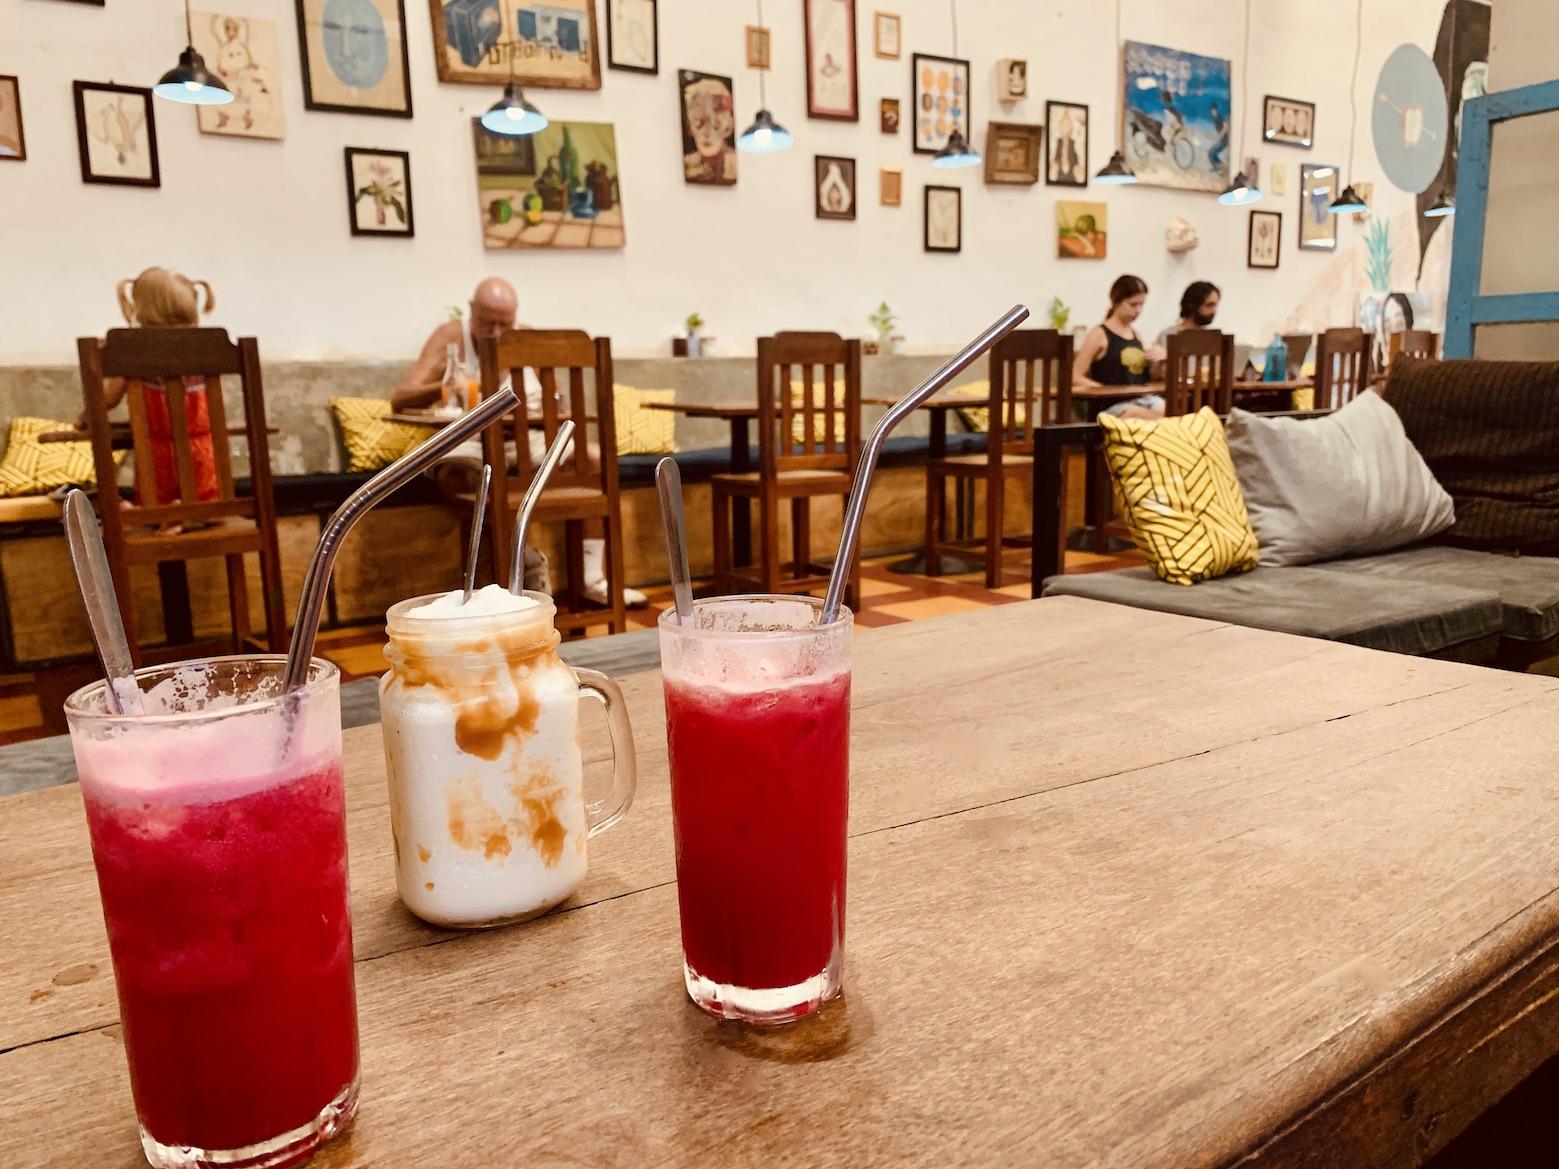 Juices and milkshakes Cafe Espresso Kampot